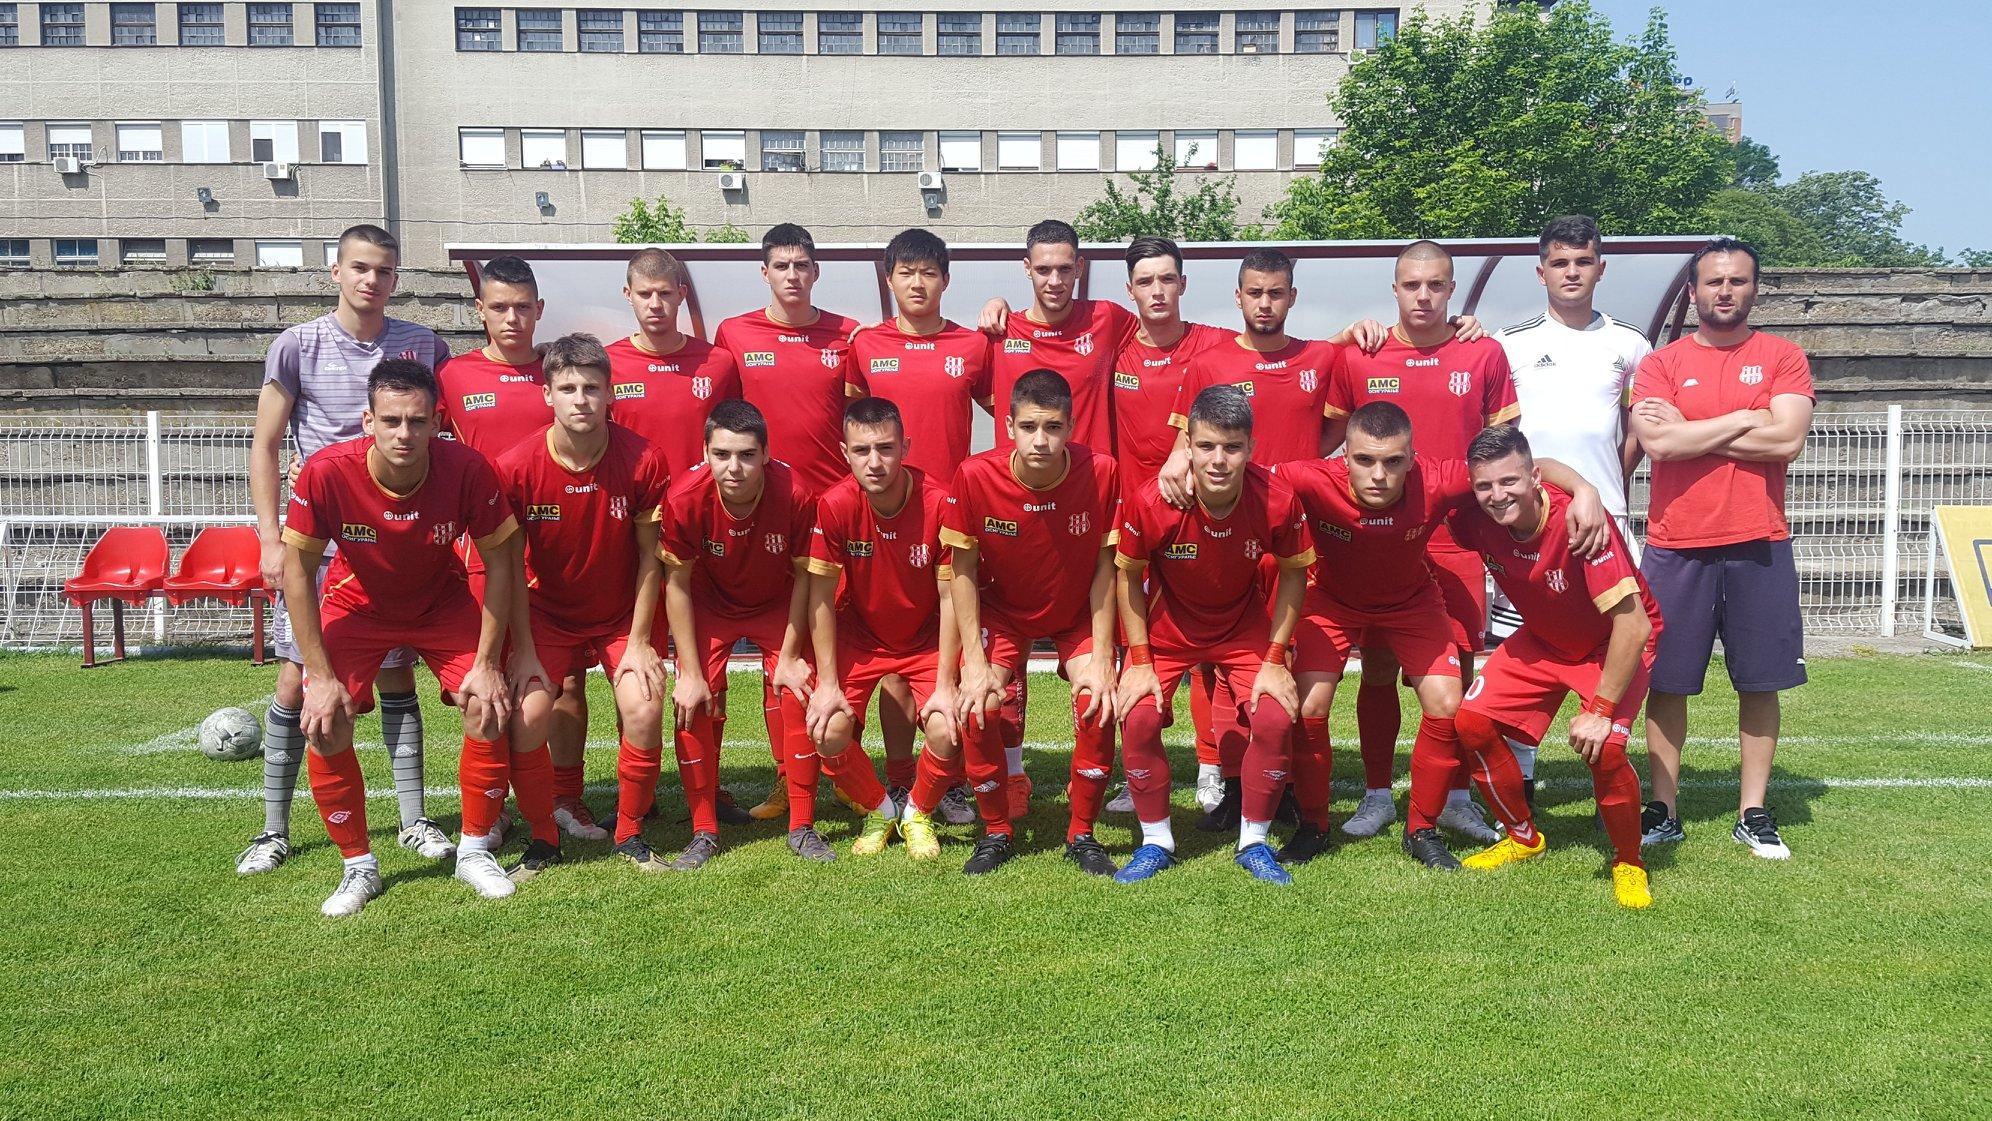 OMLADINCI FK SINĐELIĆ BEOGRAD